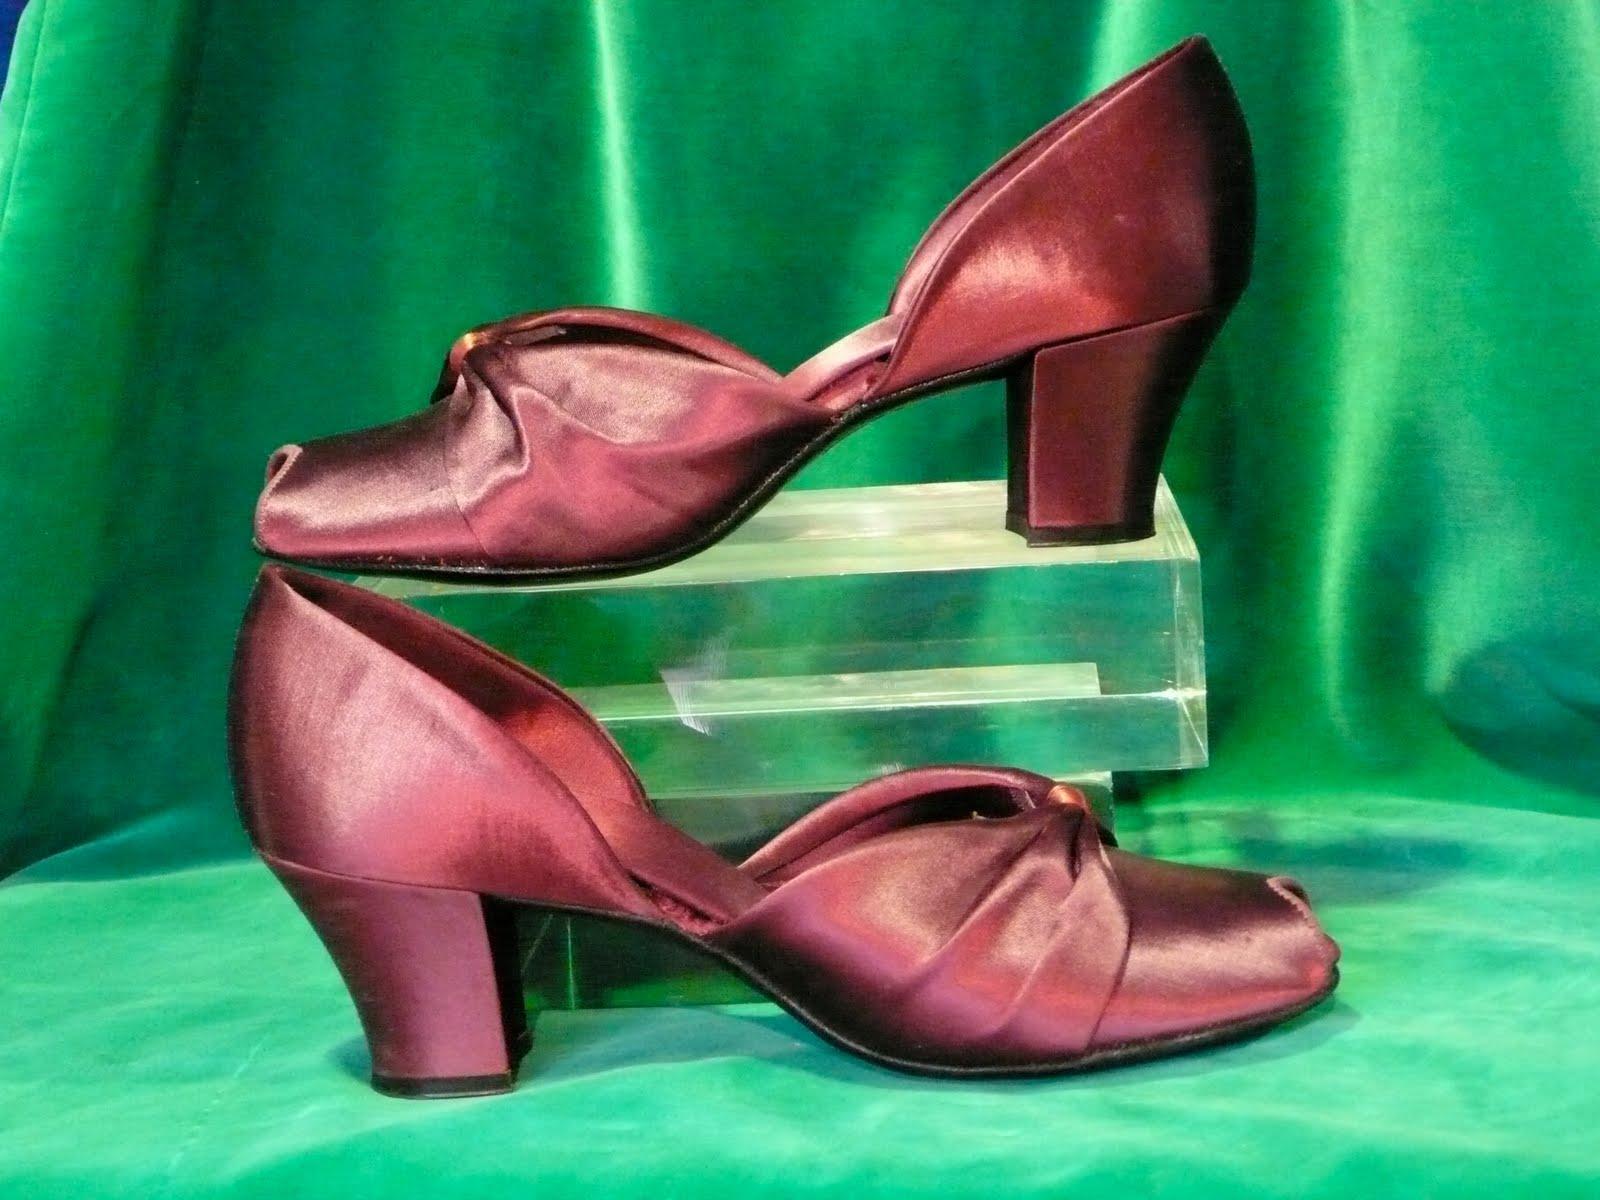 Vintage Palace Vintage Daniel Green Shoes